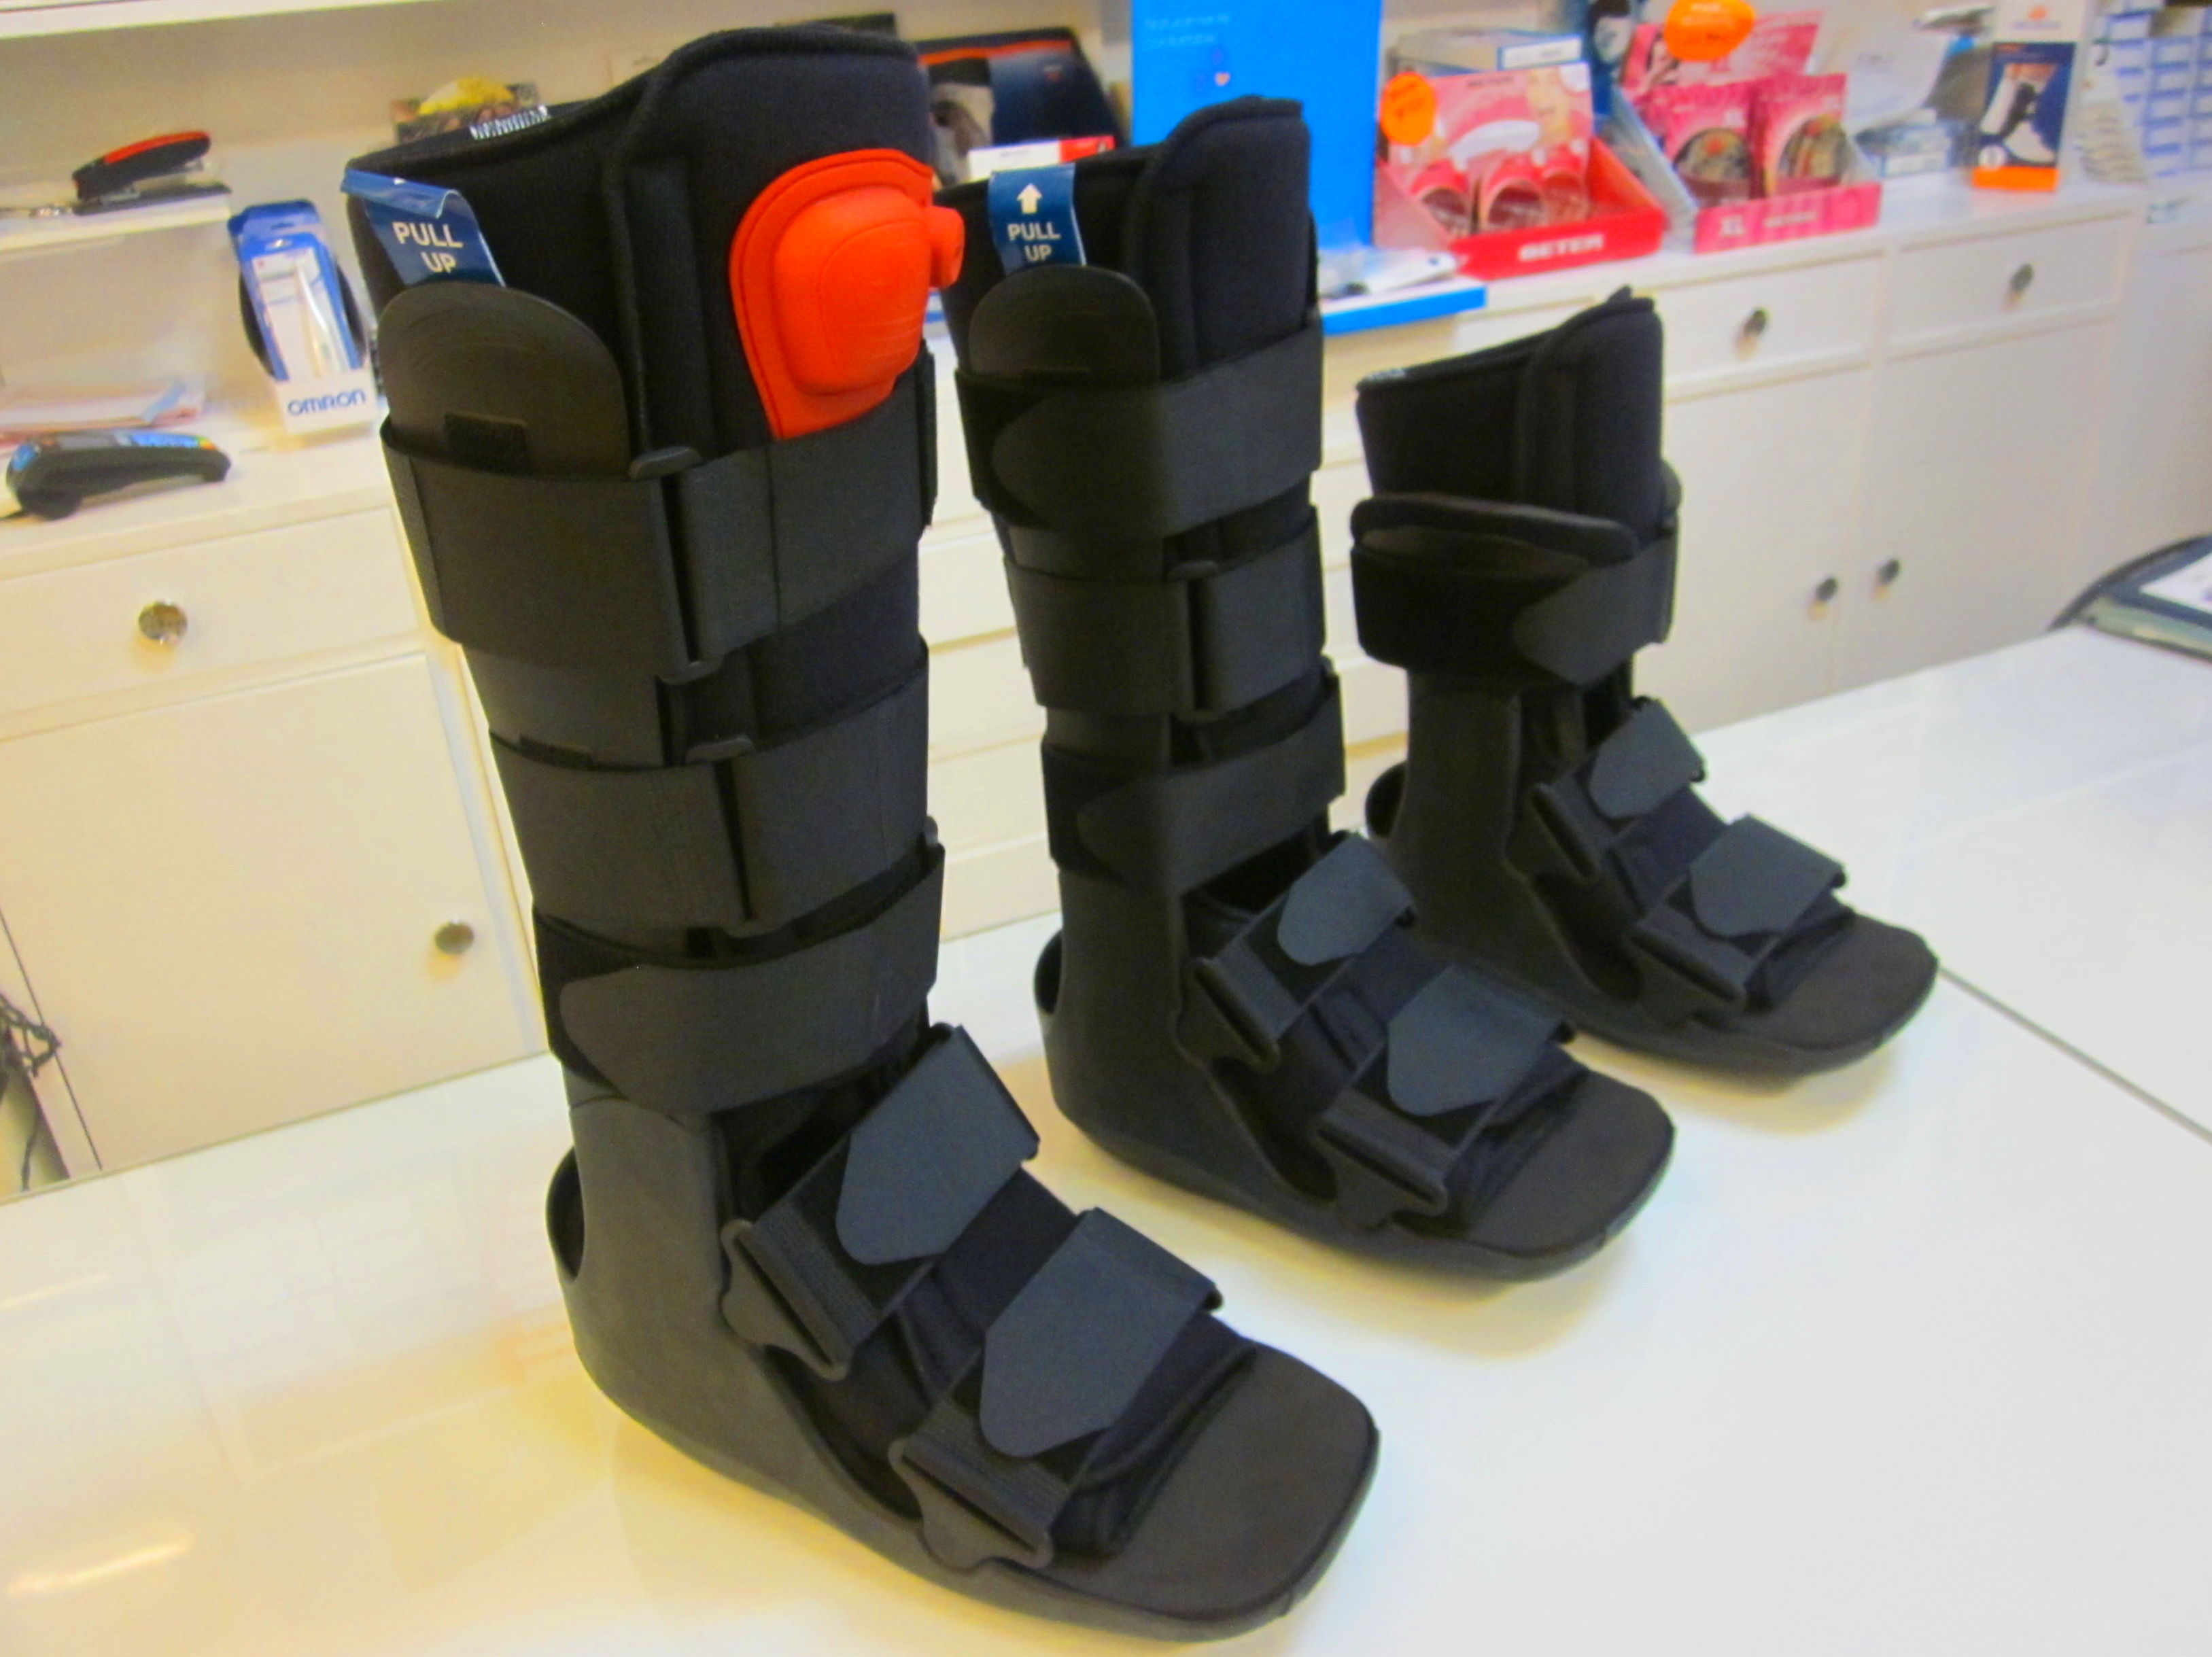 Botas Walker: Catálogo de Ortopedia Crif